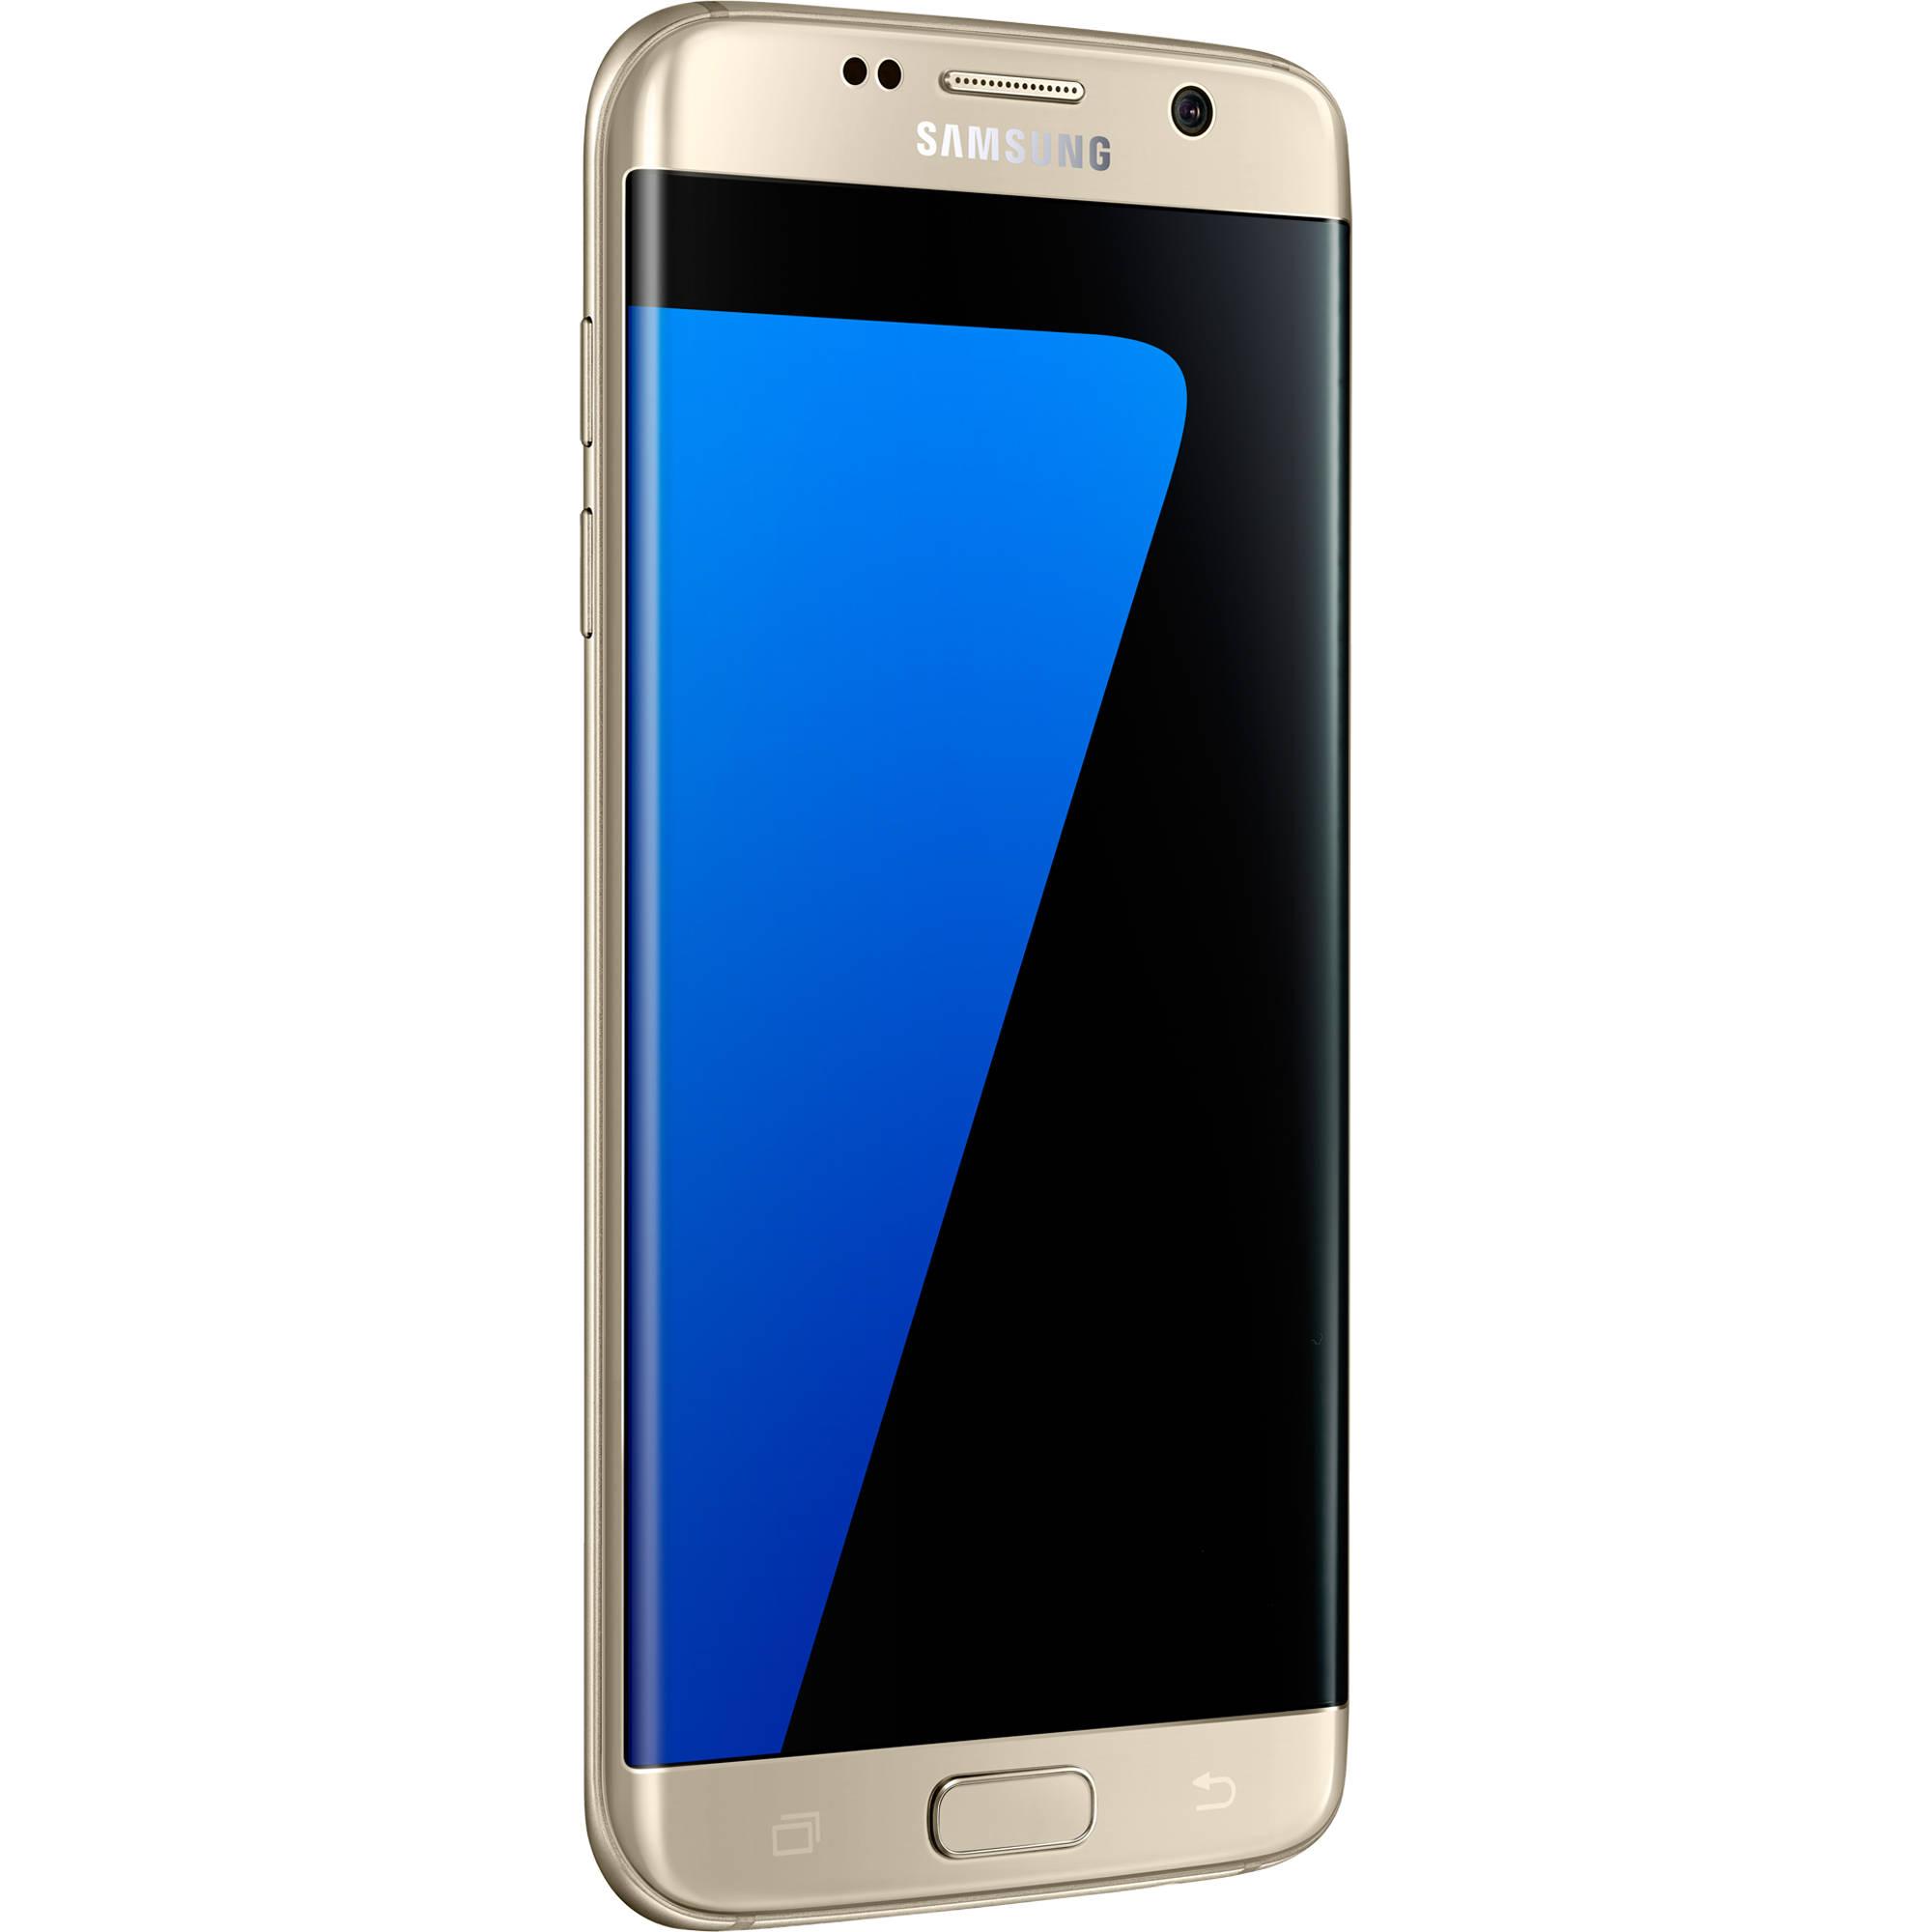 Samsung Galaxy S7 edge Duos SM-G935FD 32GB Smartphone (Unlocked, Gold)